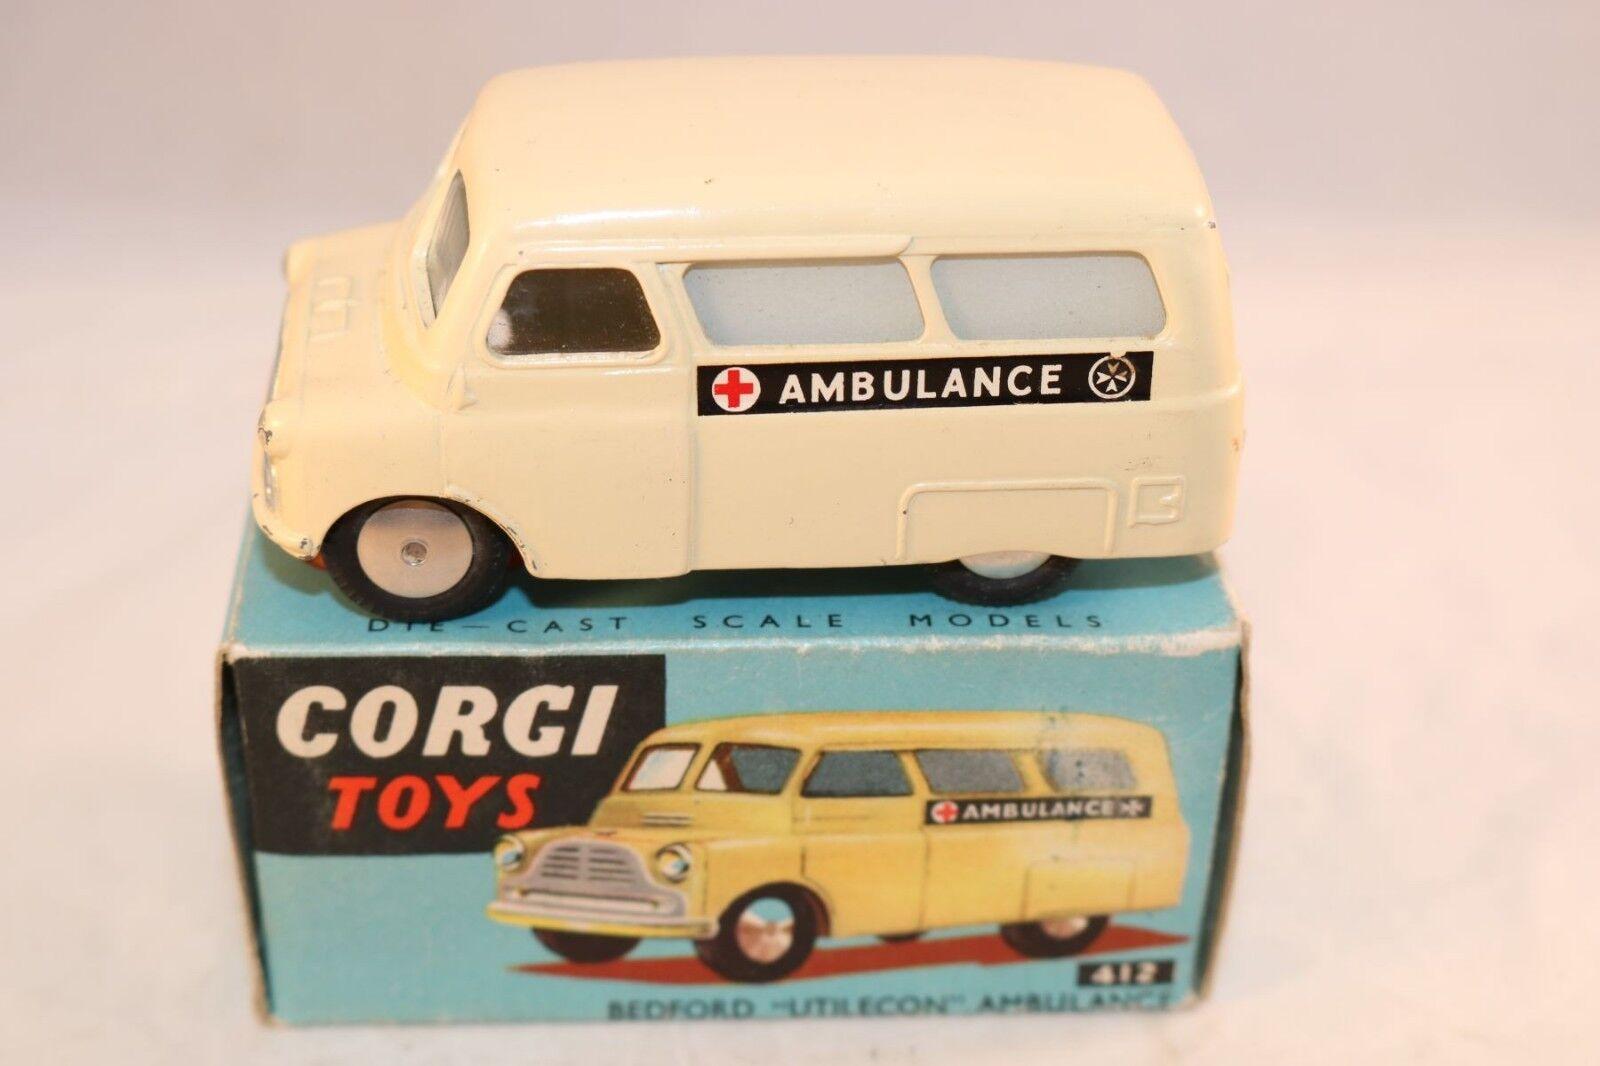 Corgi Toys 412 Bedford  Utilecon Ambulance very near mint in box